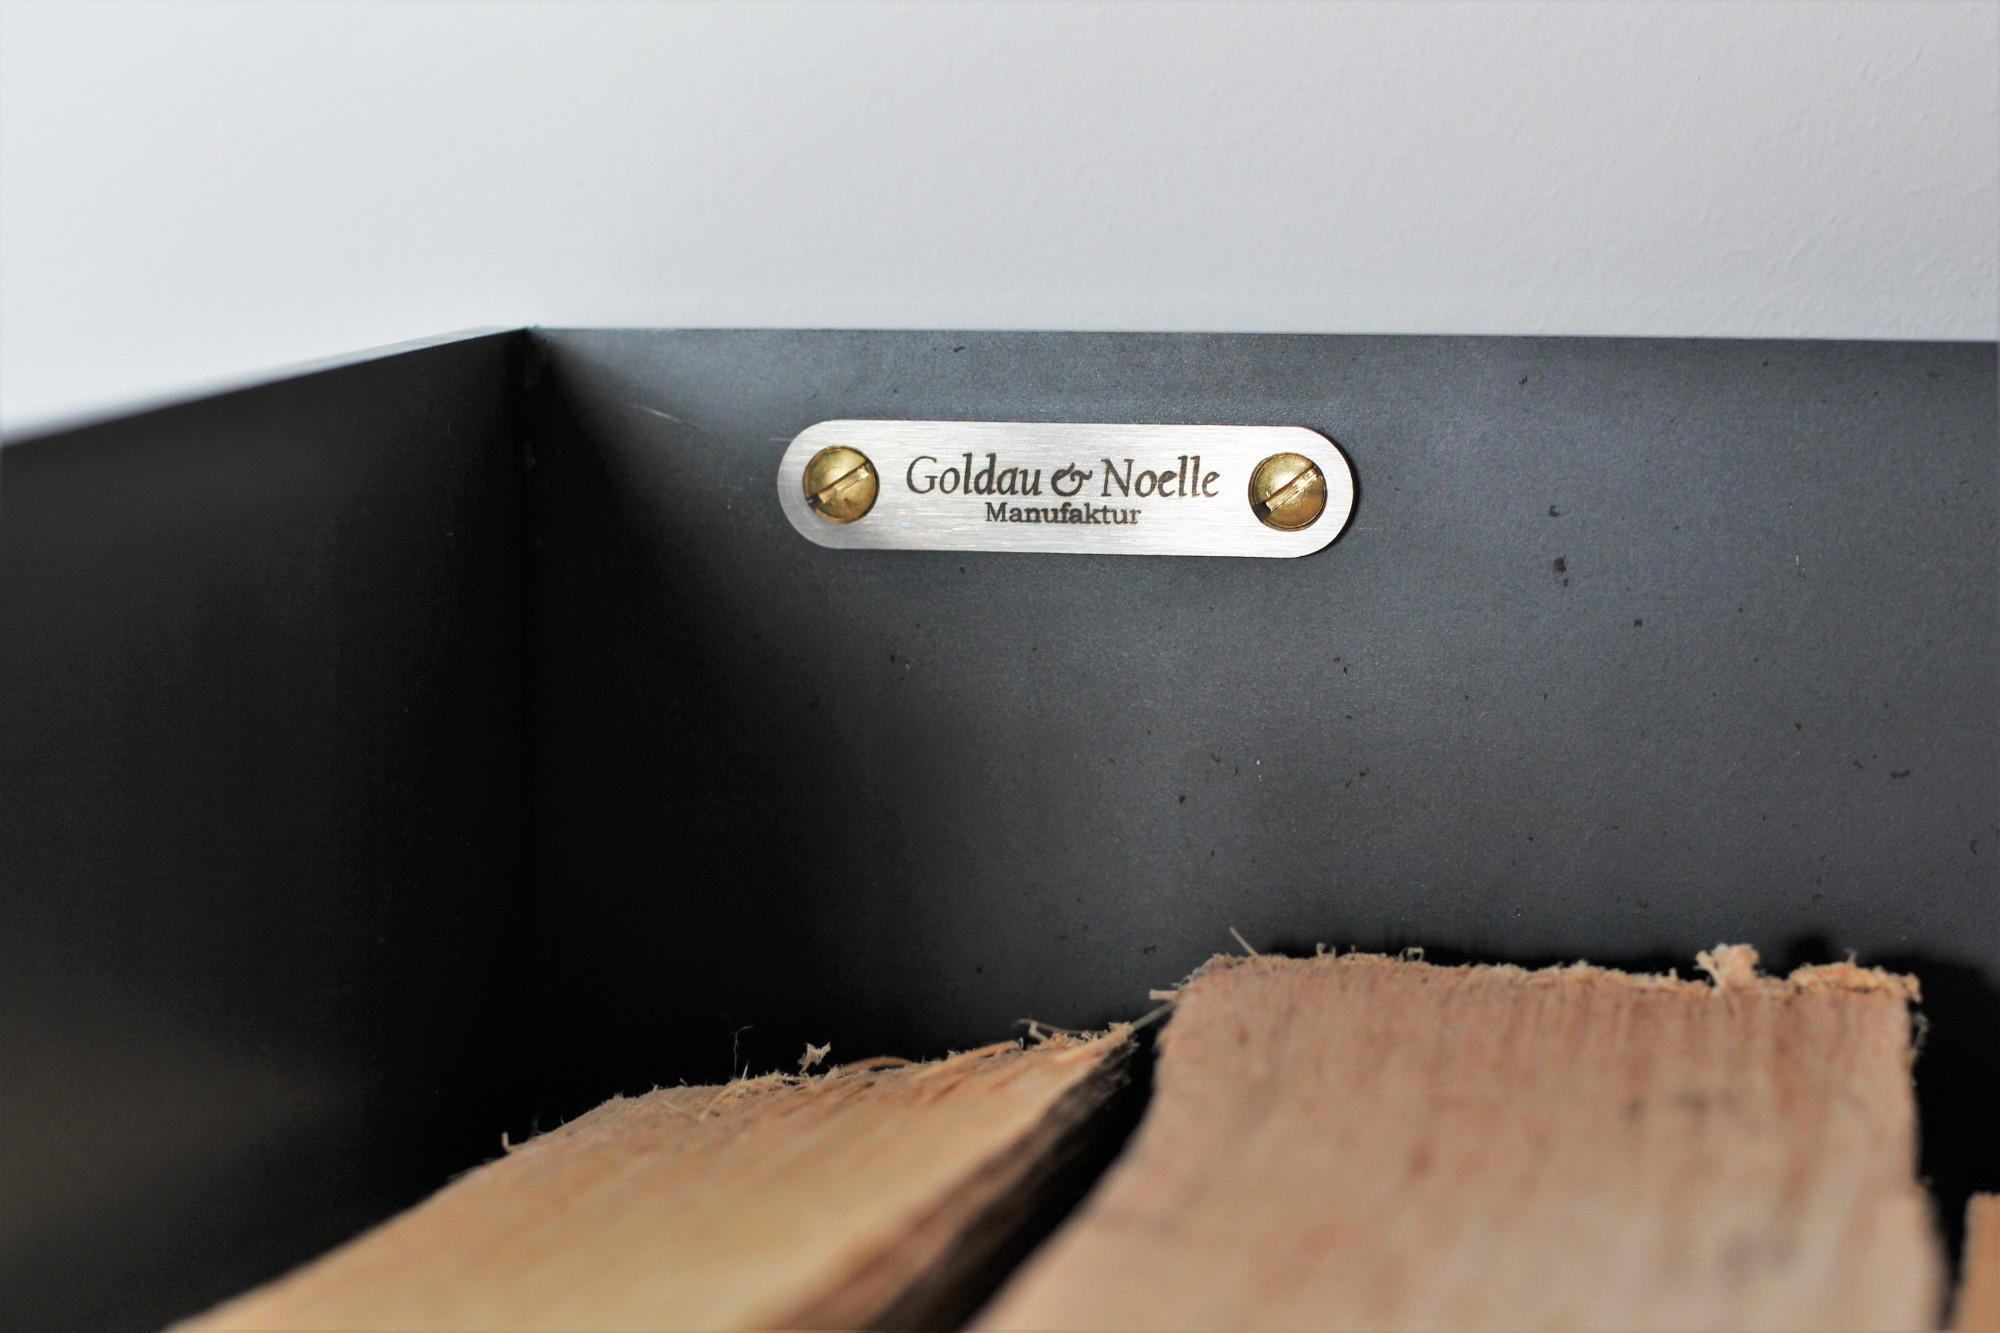 kaminholzregal ferro aus metall f r innen goldau noelle manufaktur. Black Bedroom Furniture Sets. Home Design Ideas